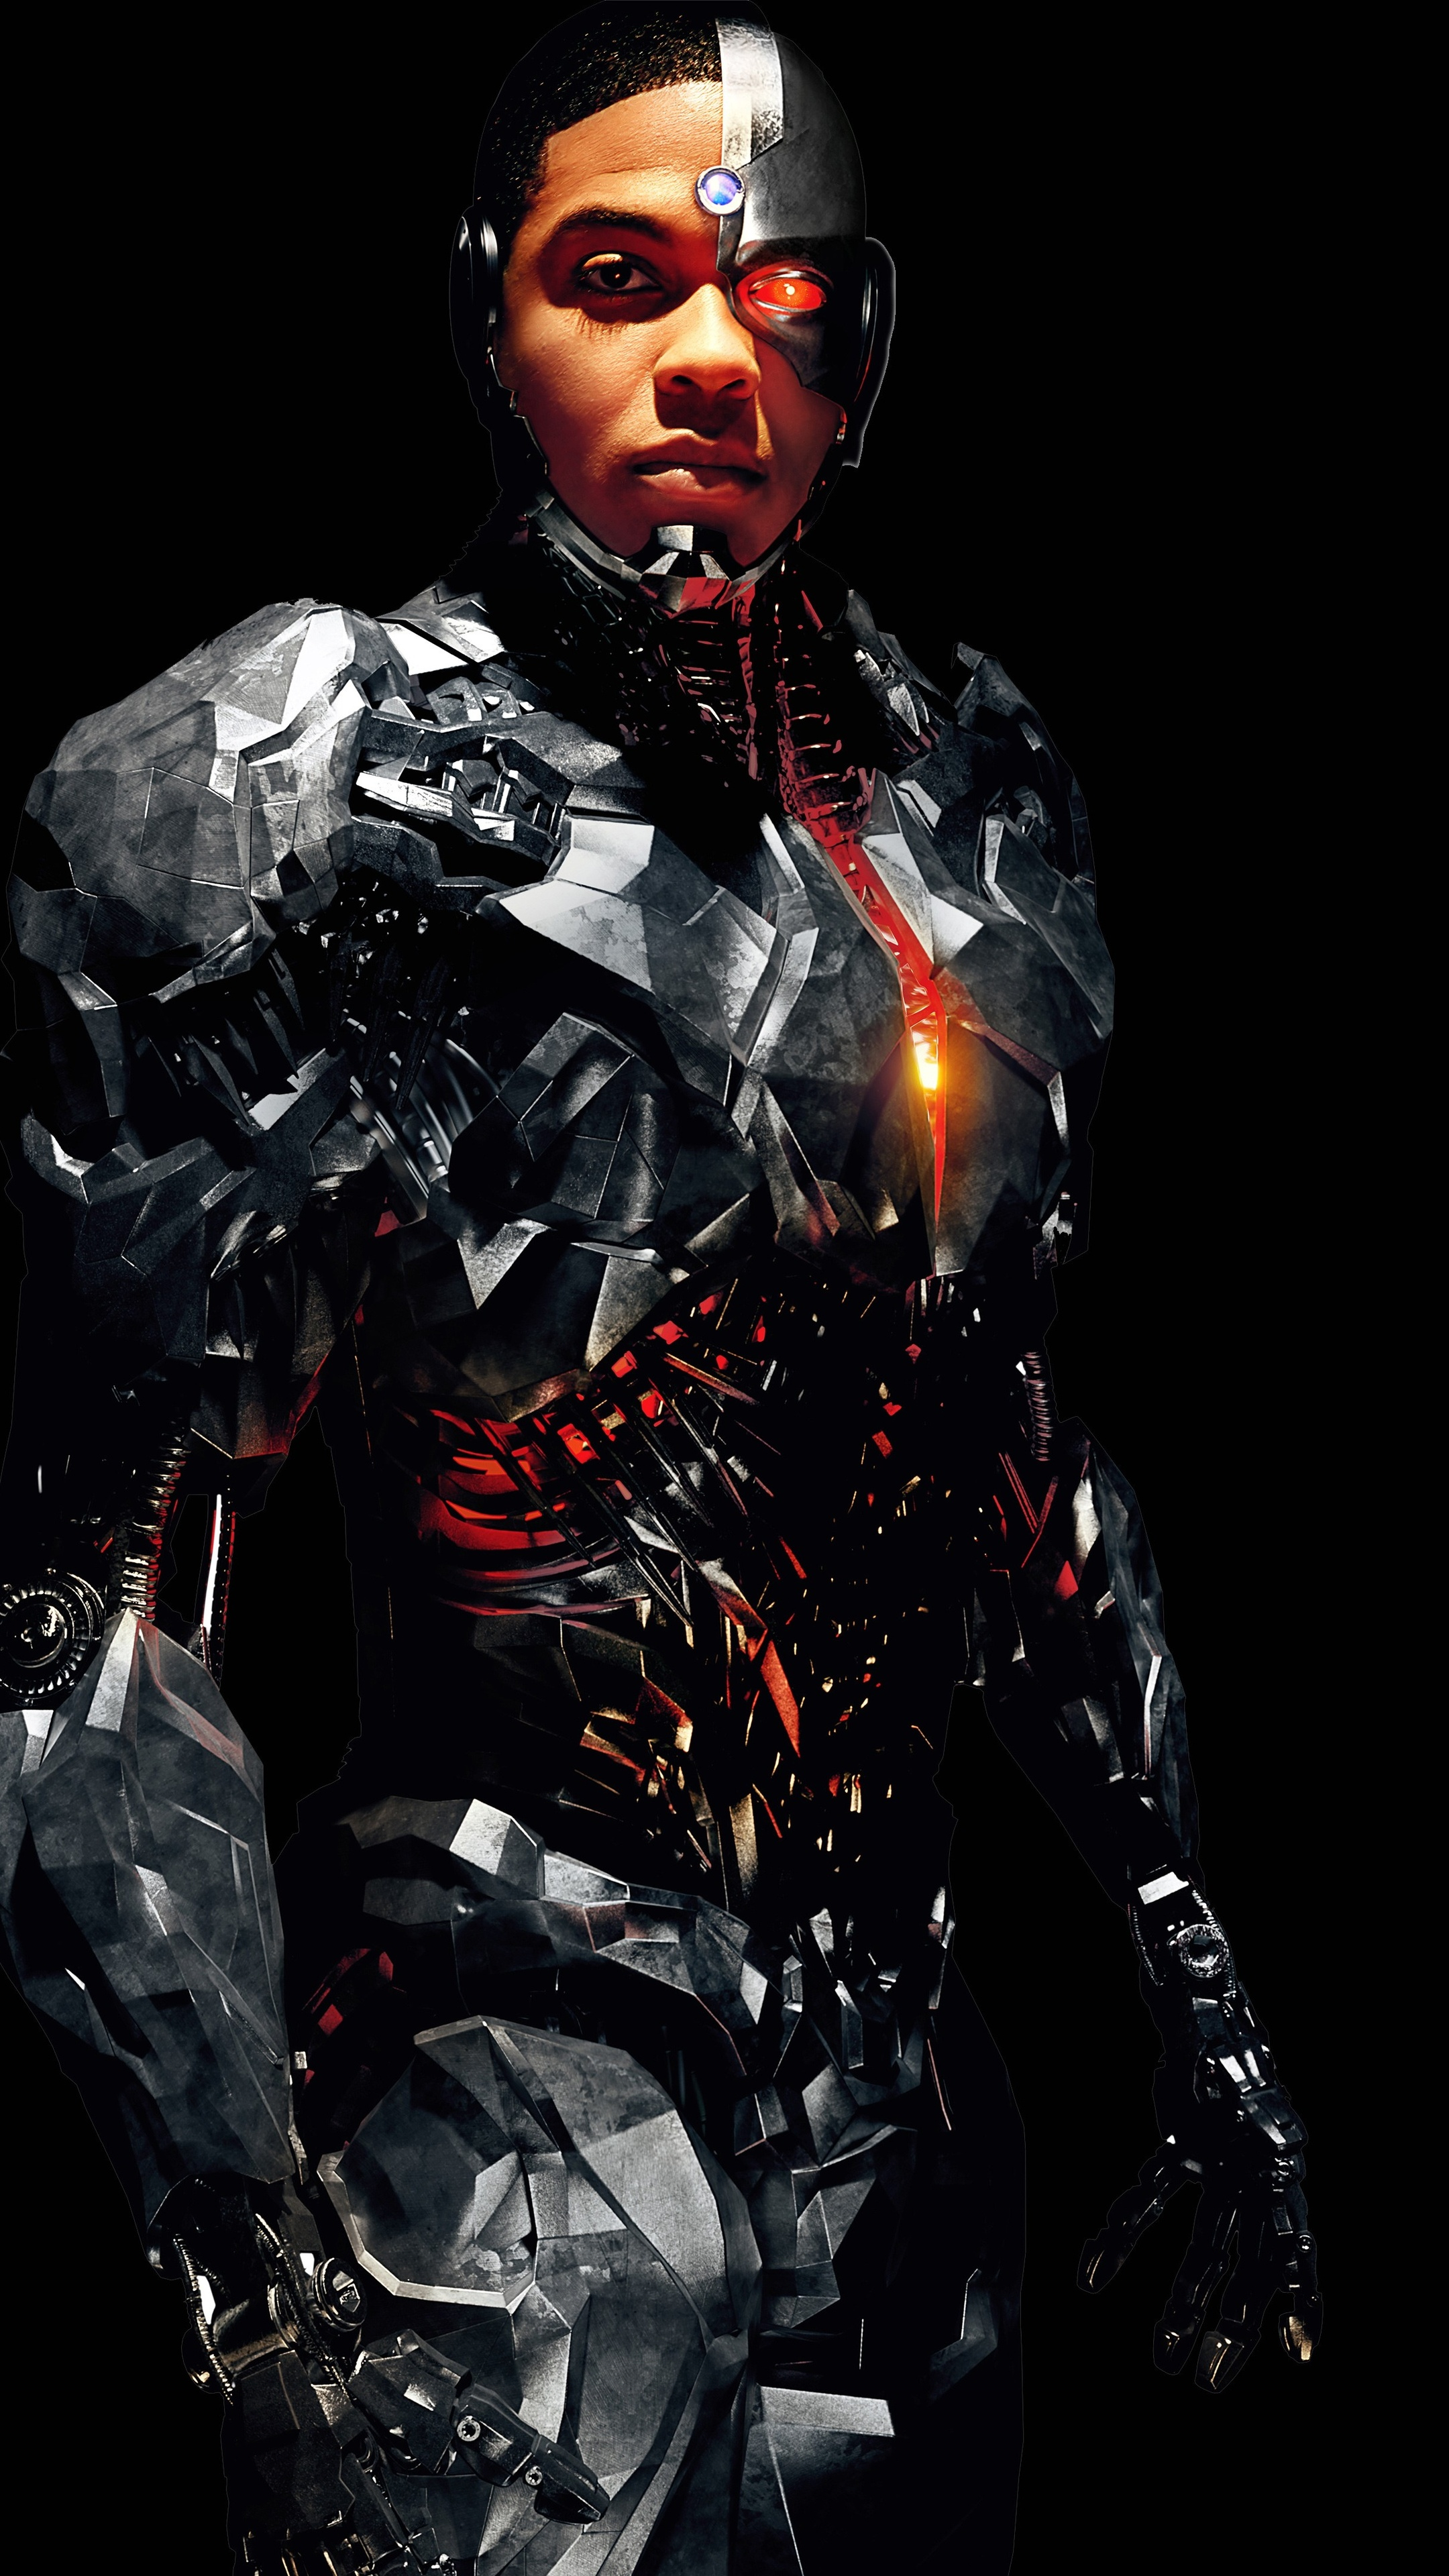 cyborg-justice-league-8k-54.jpg